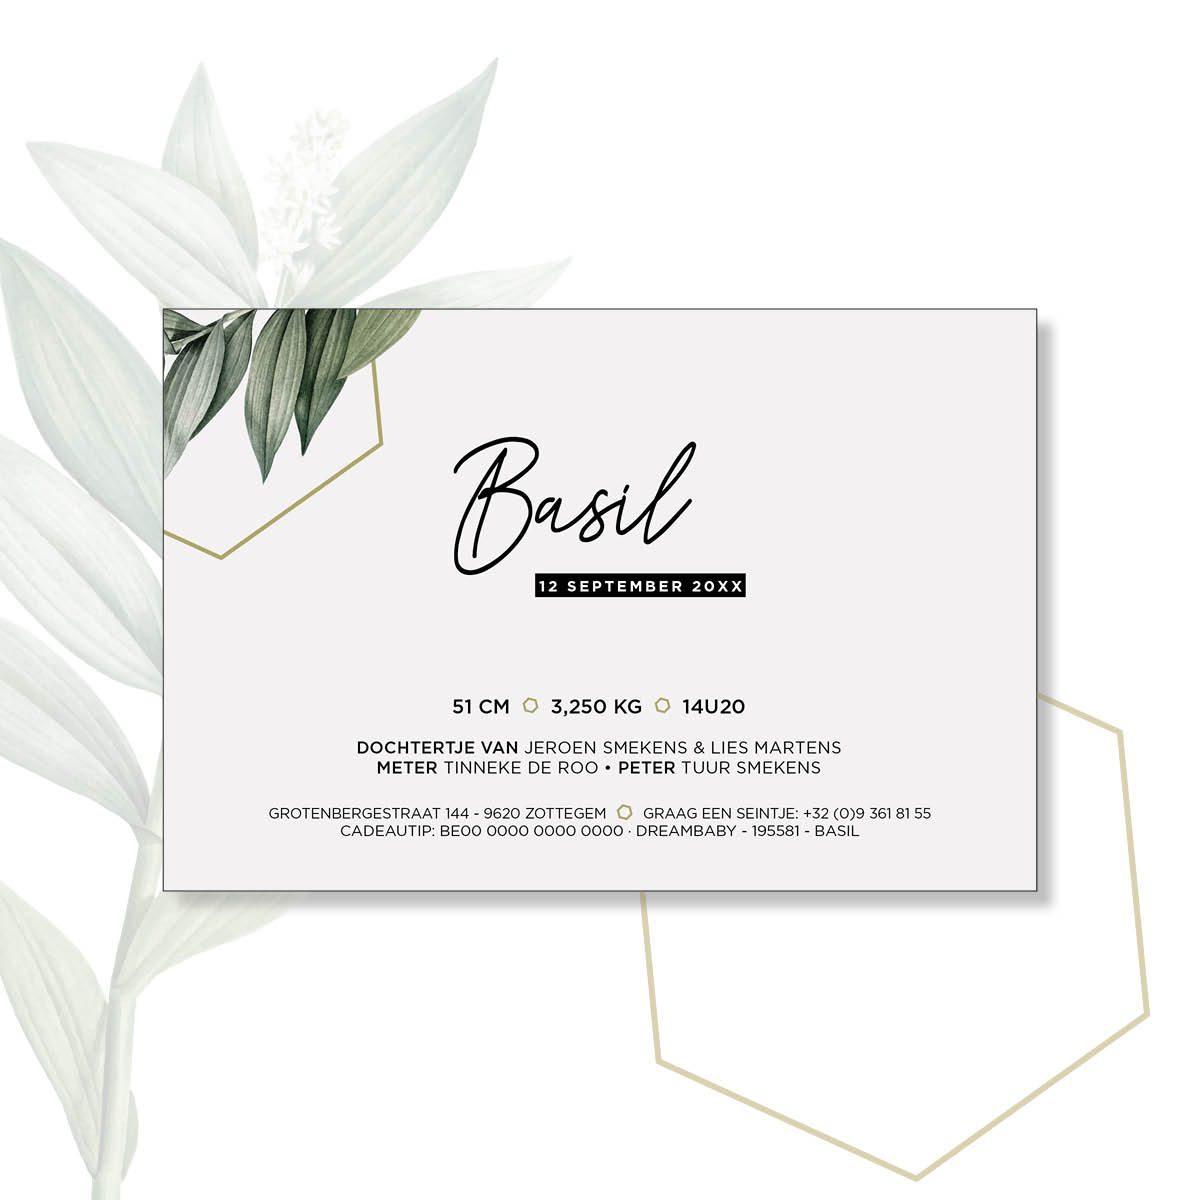 web basil steffi 10×15 enkel2